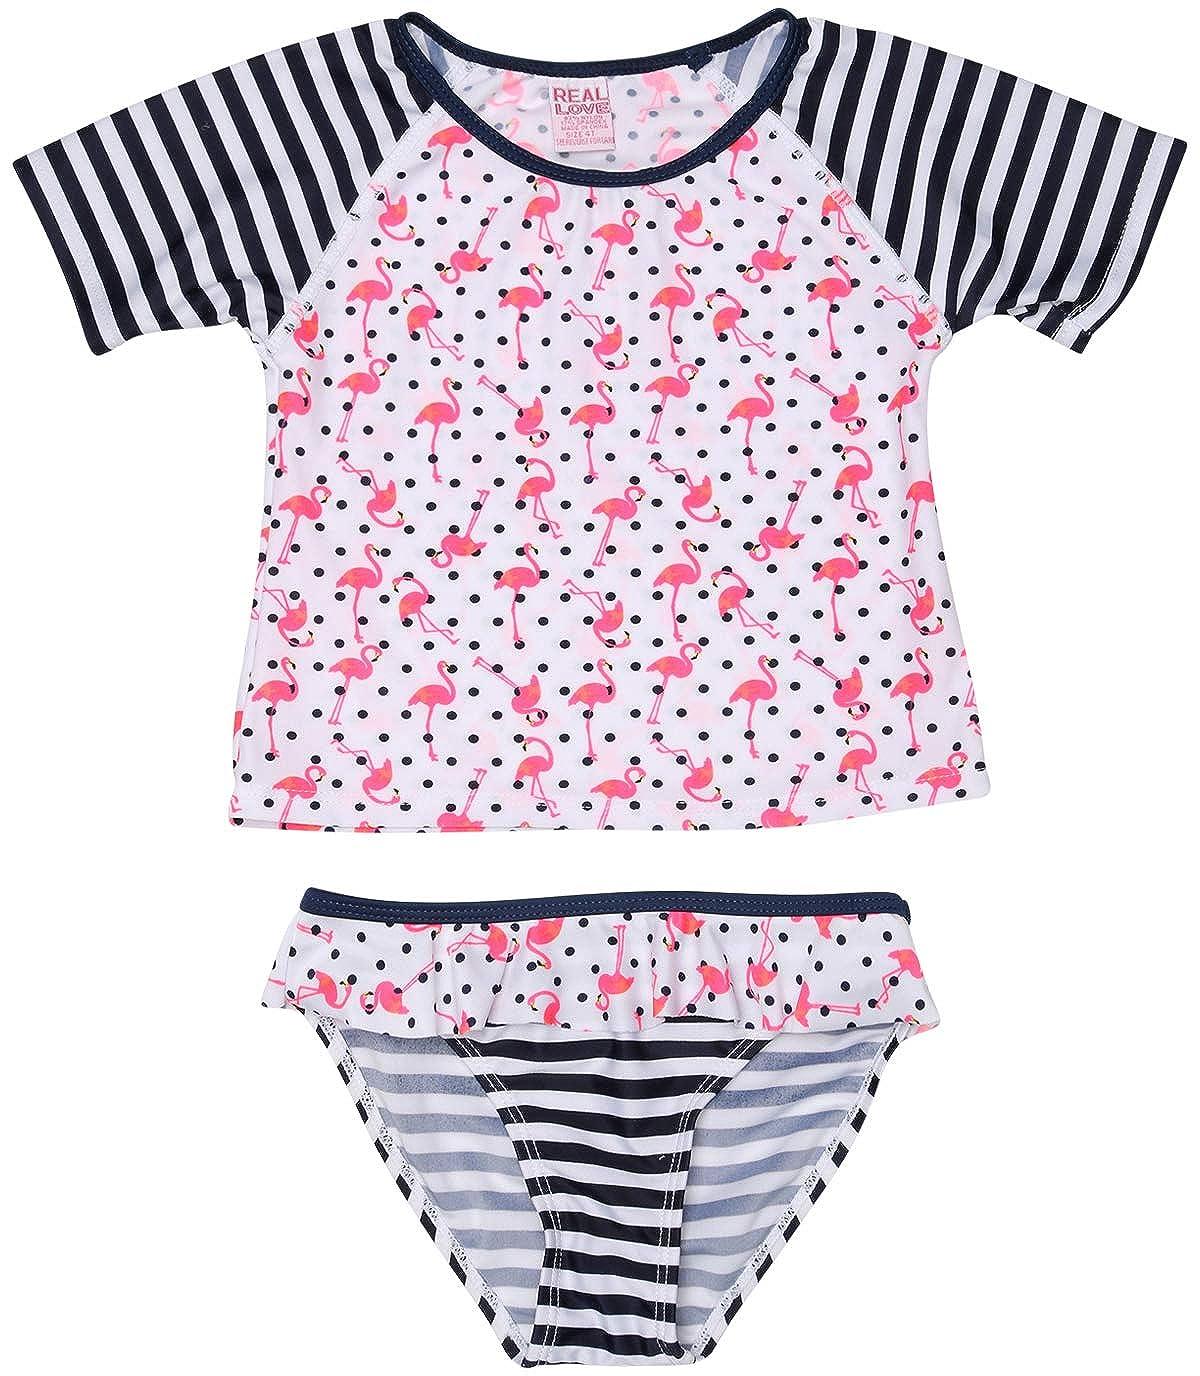 2 Tops and 2 Bikini Bottoms Real Love Baby Girls/' 4-Piece Rashguard Swimsuit Set